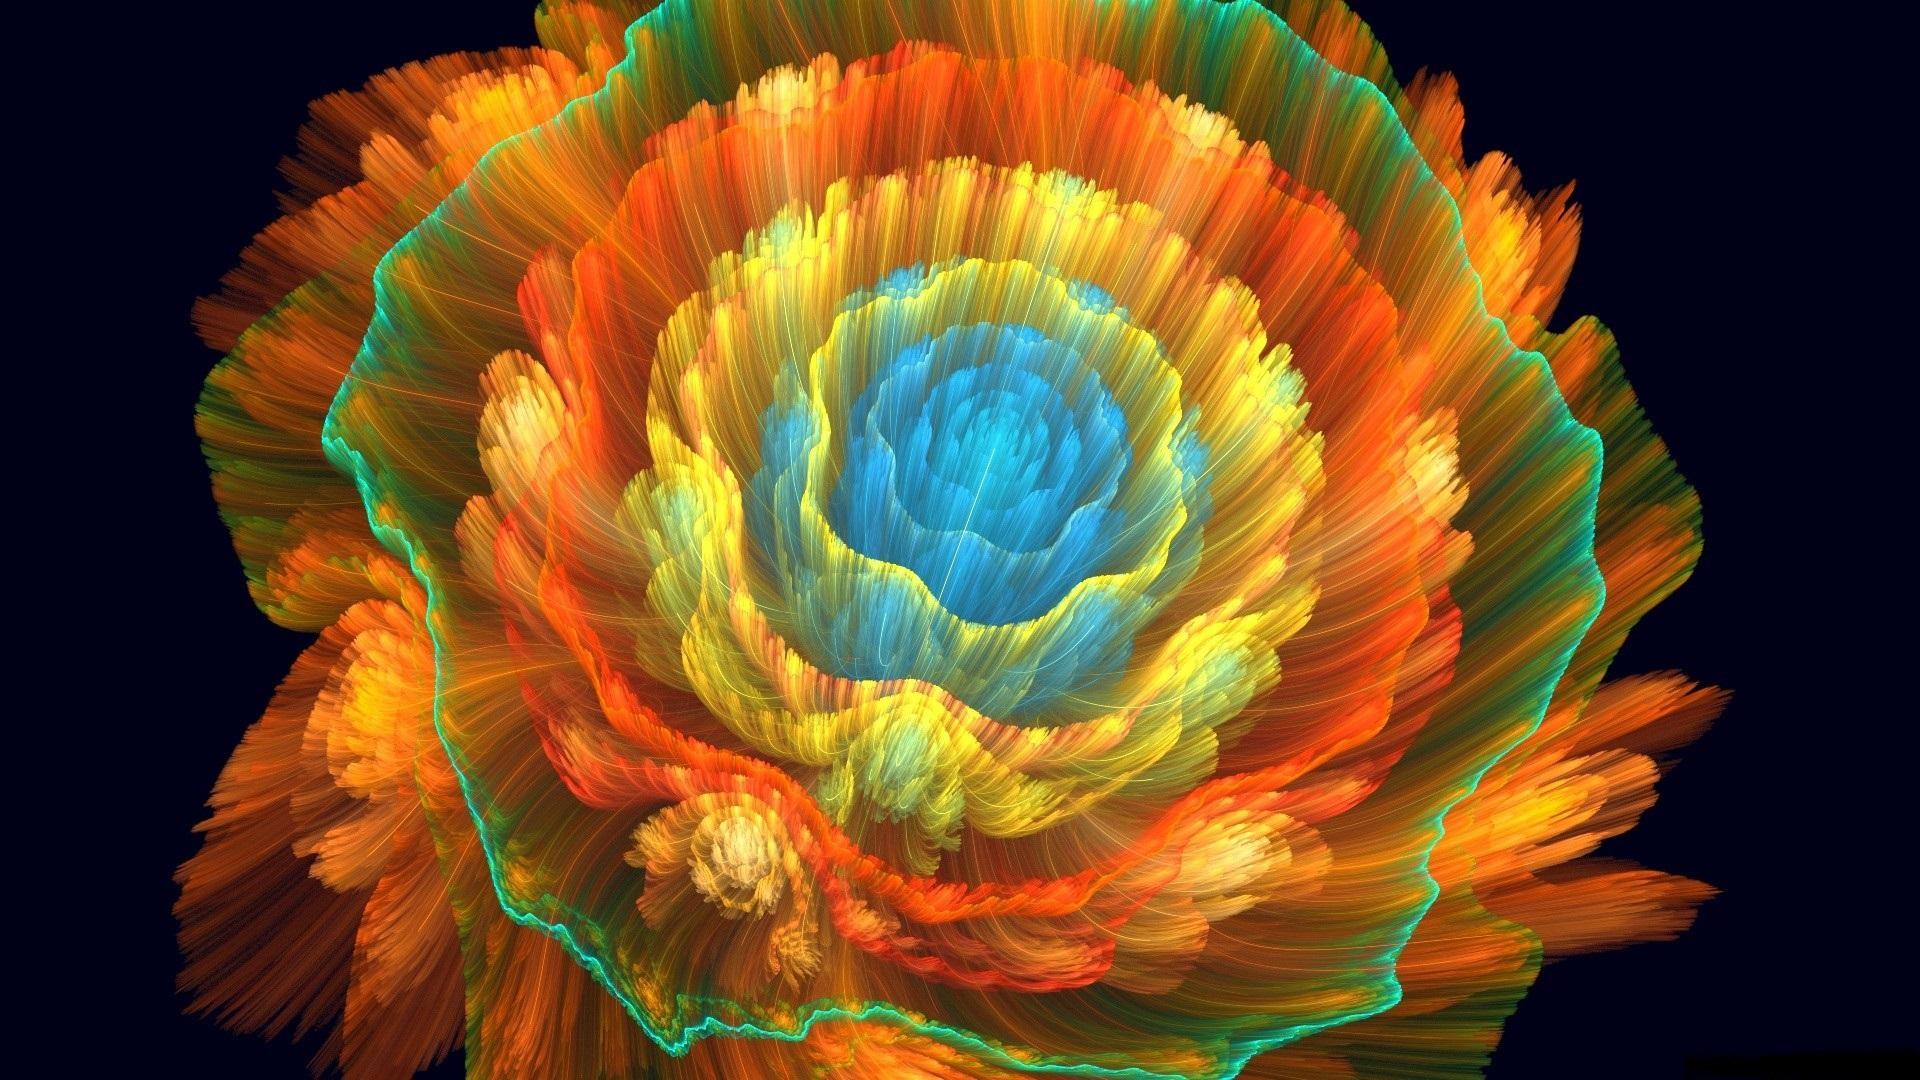 1920x1080 Abstracto Full Hd 1920x1080: Fondos De Pantalla Hermosa Flor Abstracta, Colorida